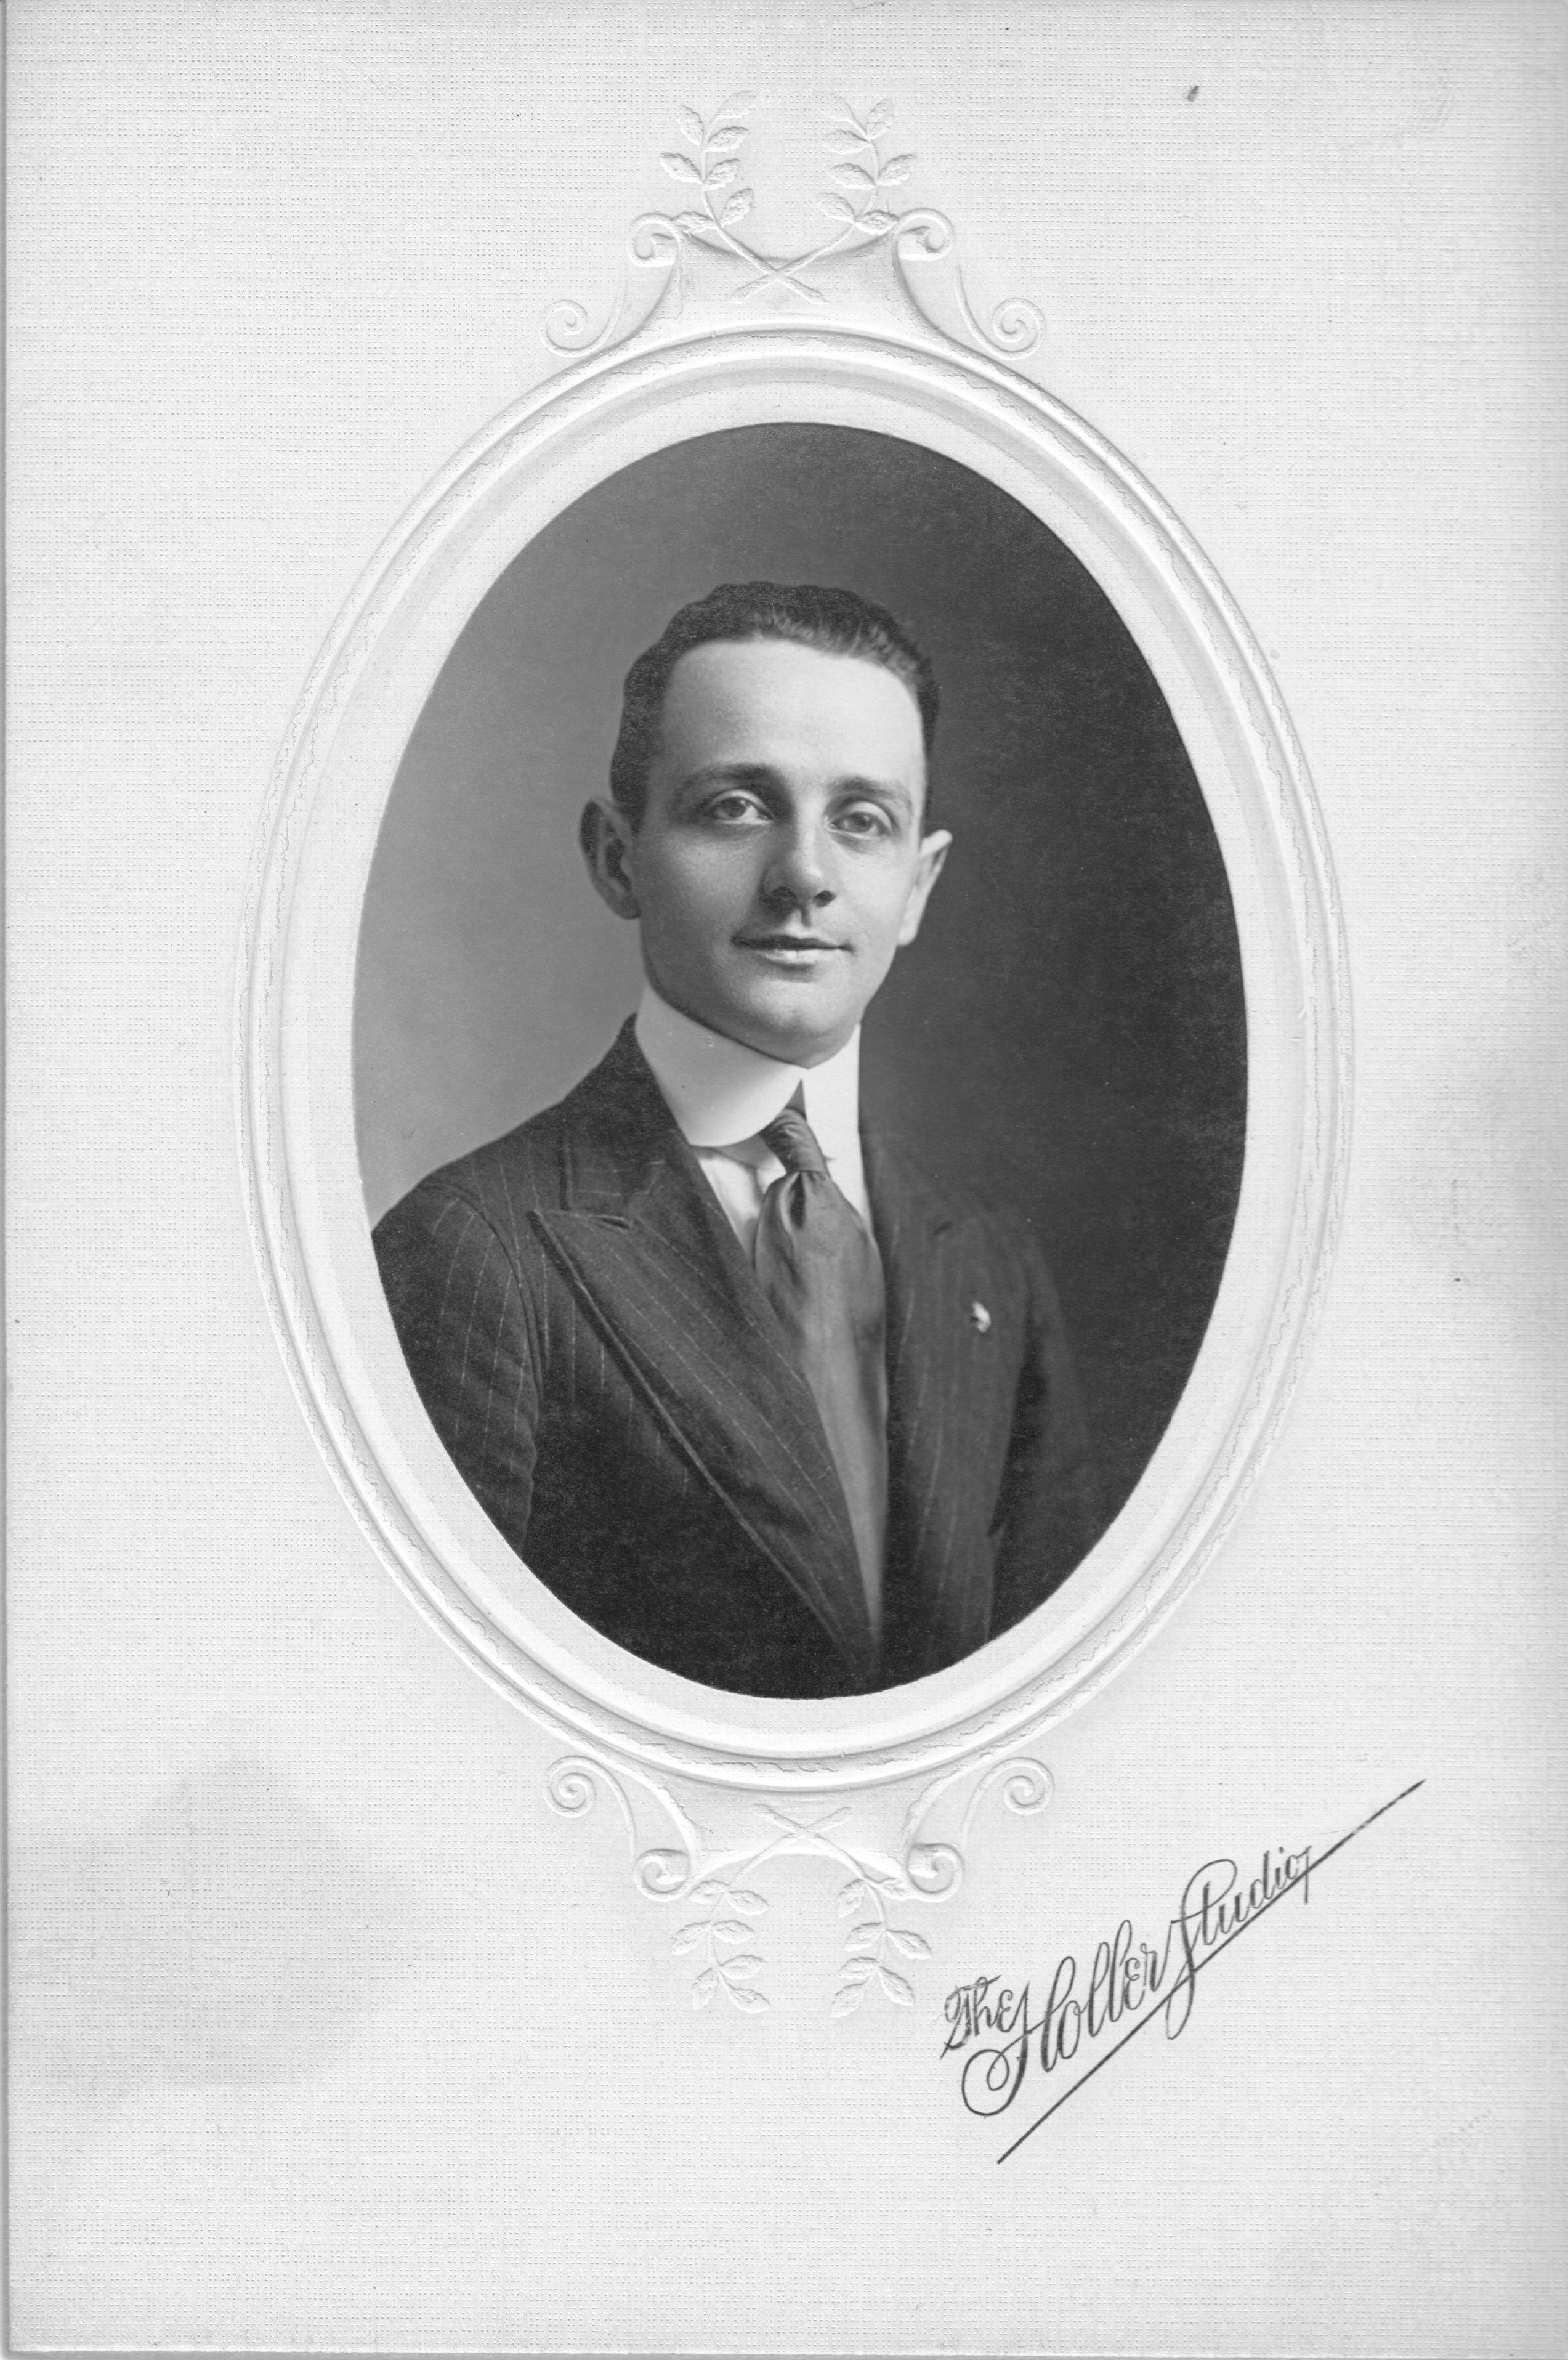 Charles Fels